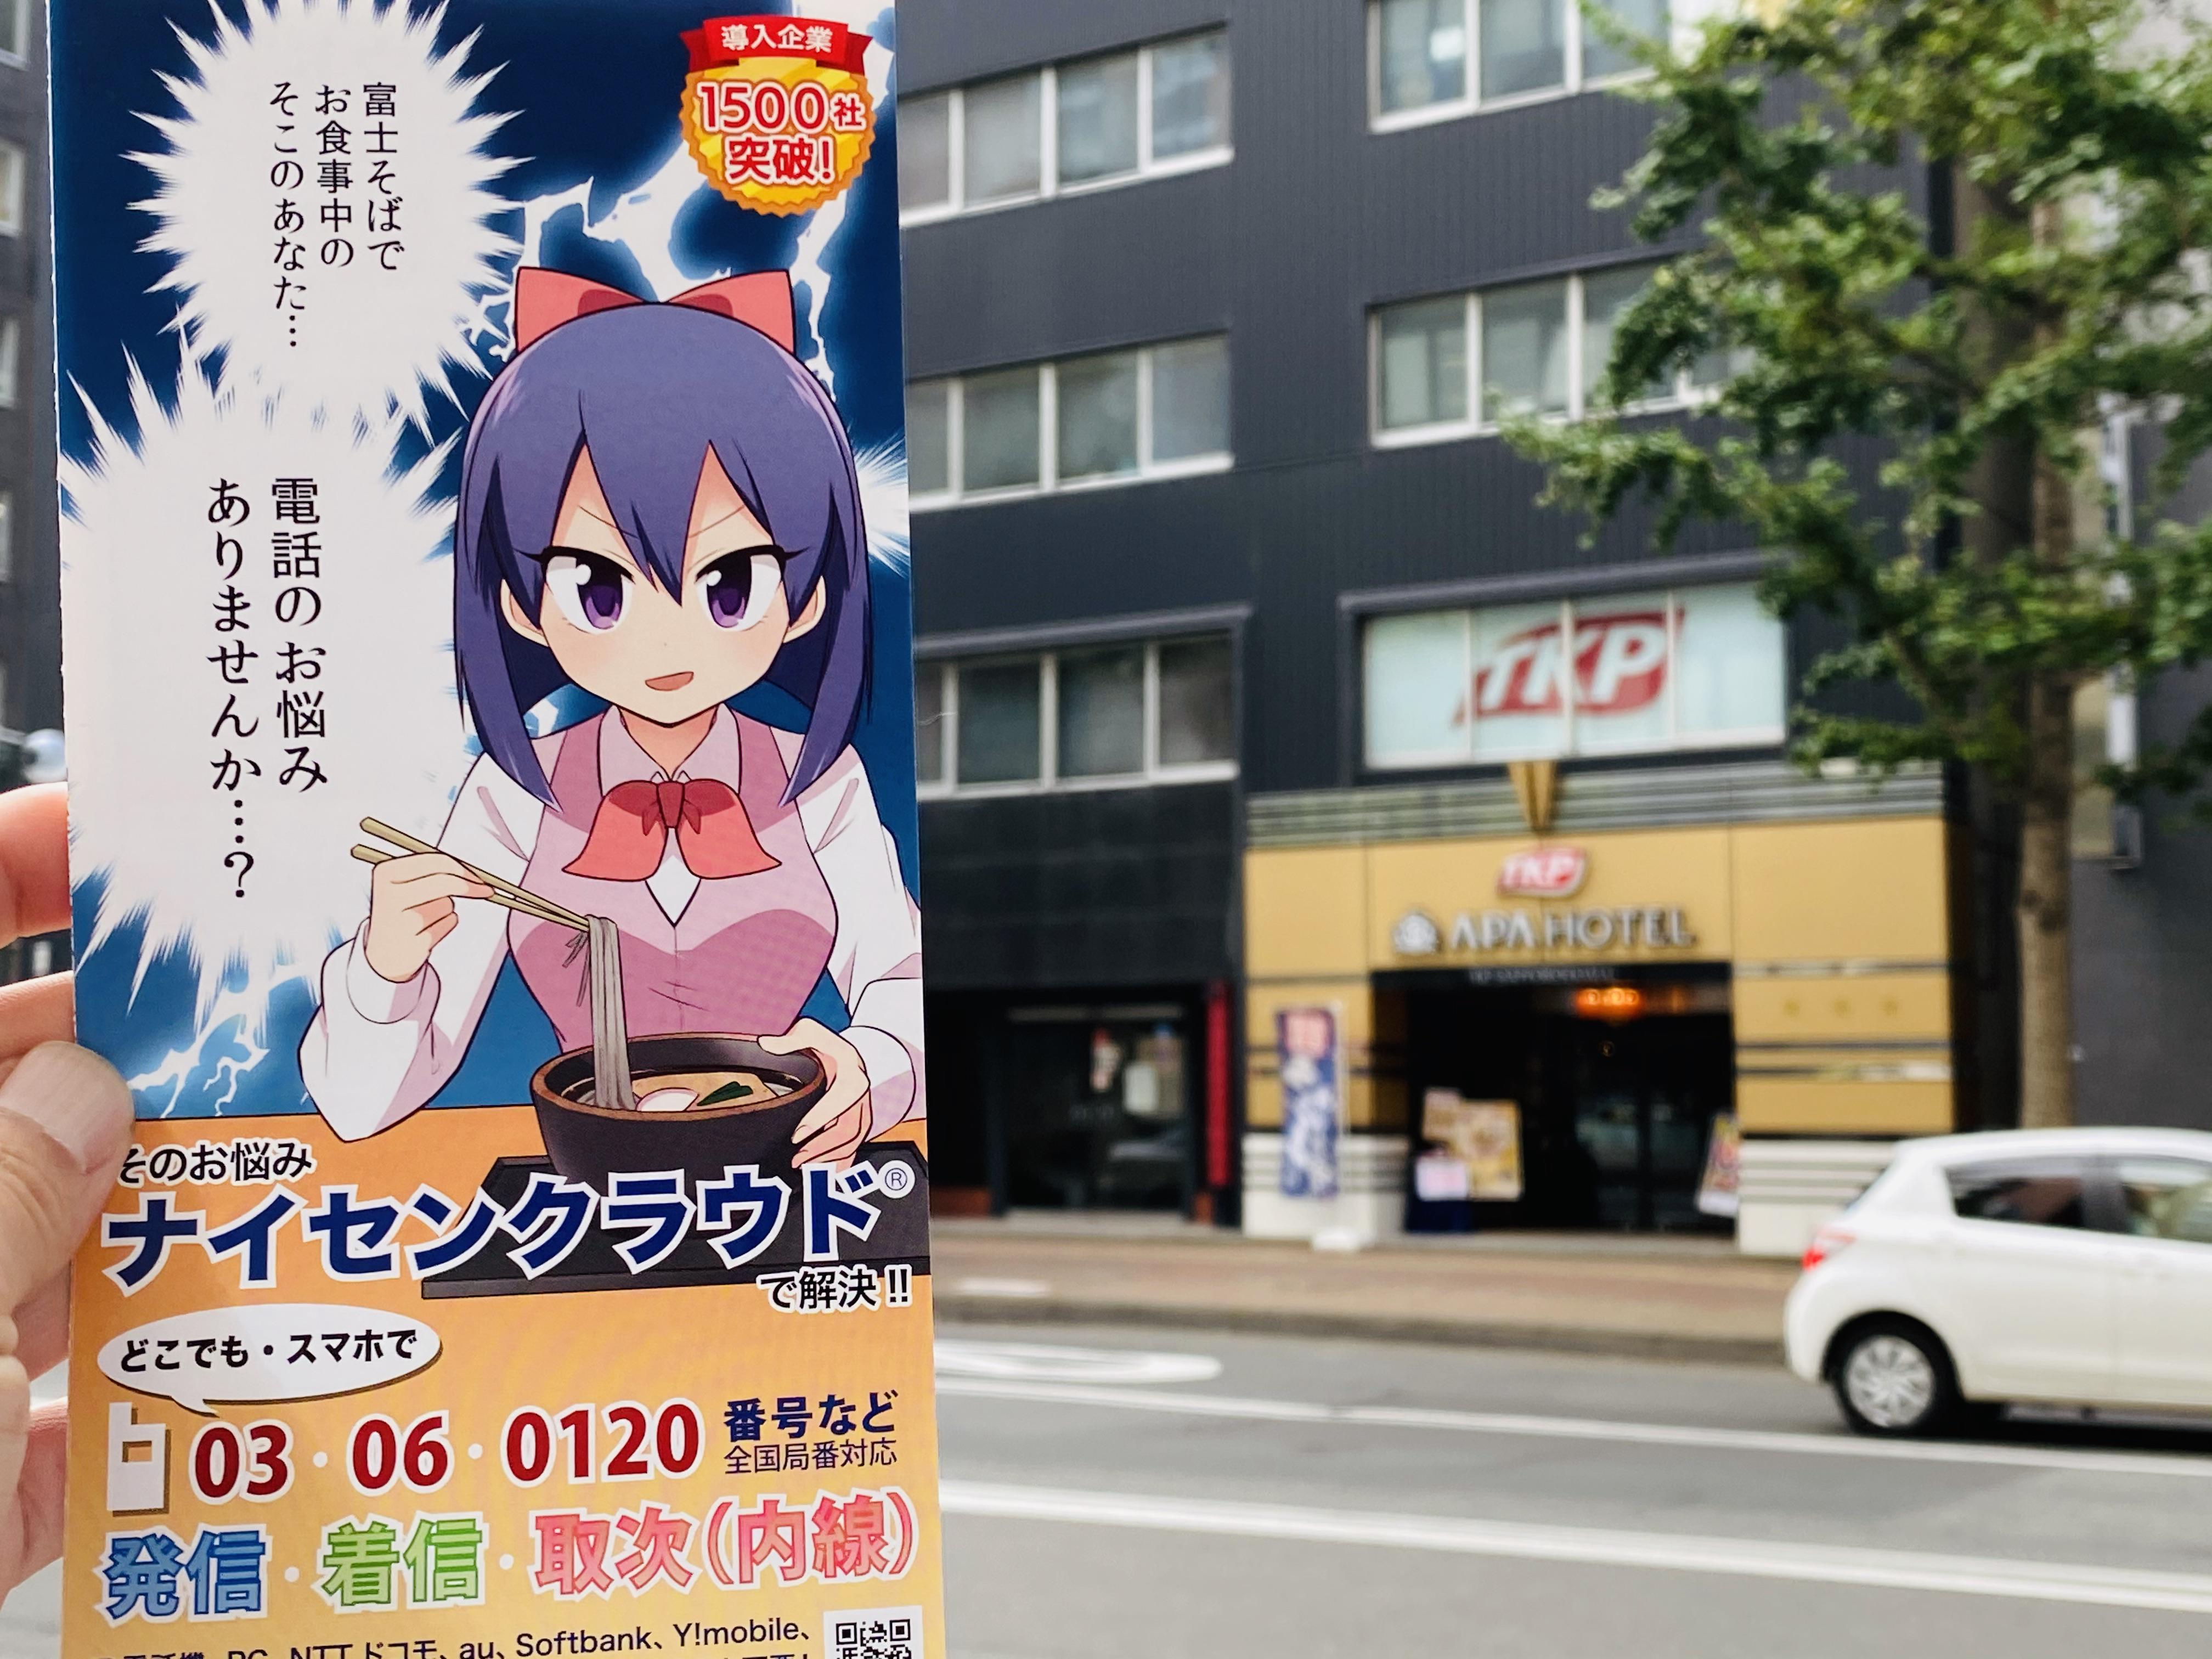 https://fujisoba.co.jp/news/assets/IMG_1736.jpg